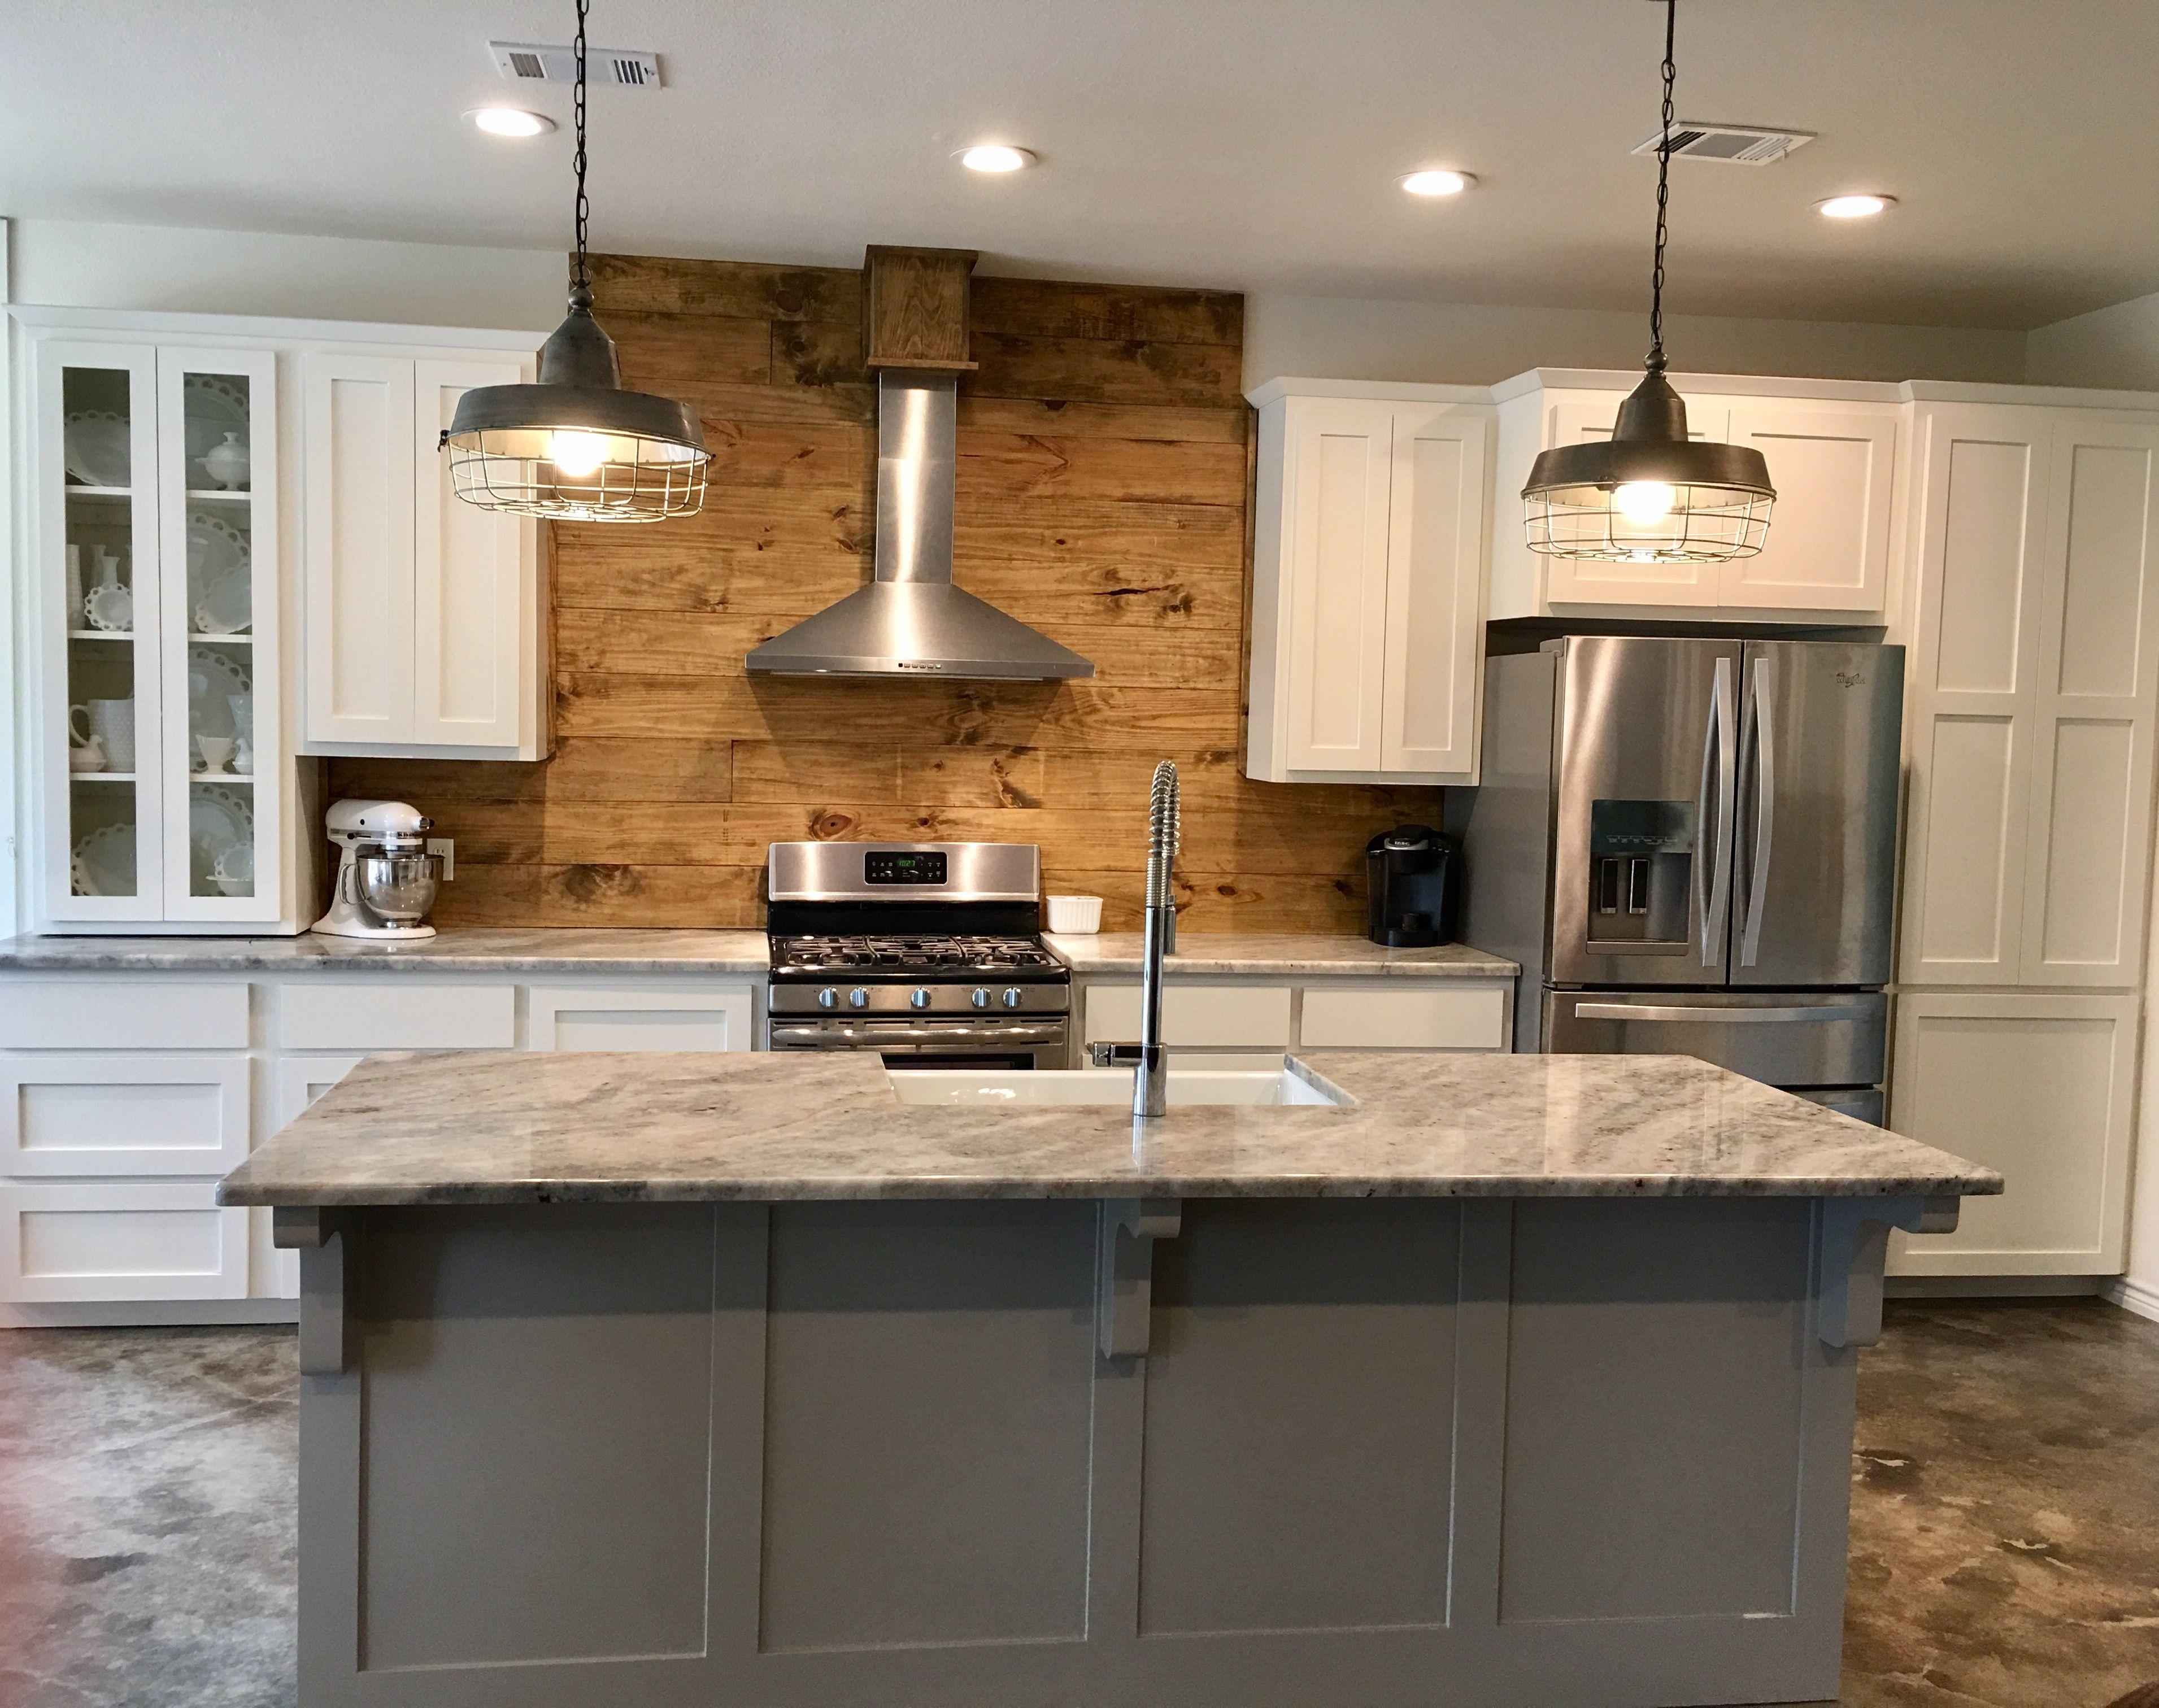 Stone Creek by Mitch Ginn: Industrial farmhouse kitchen ...